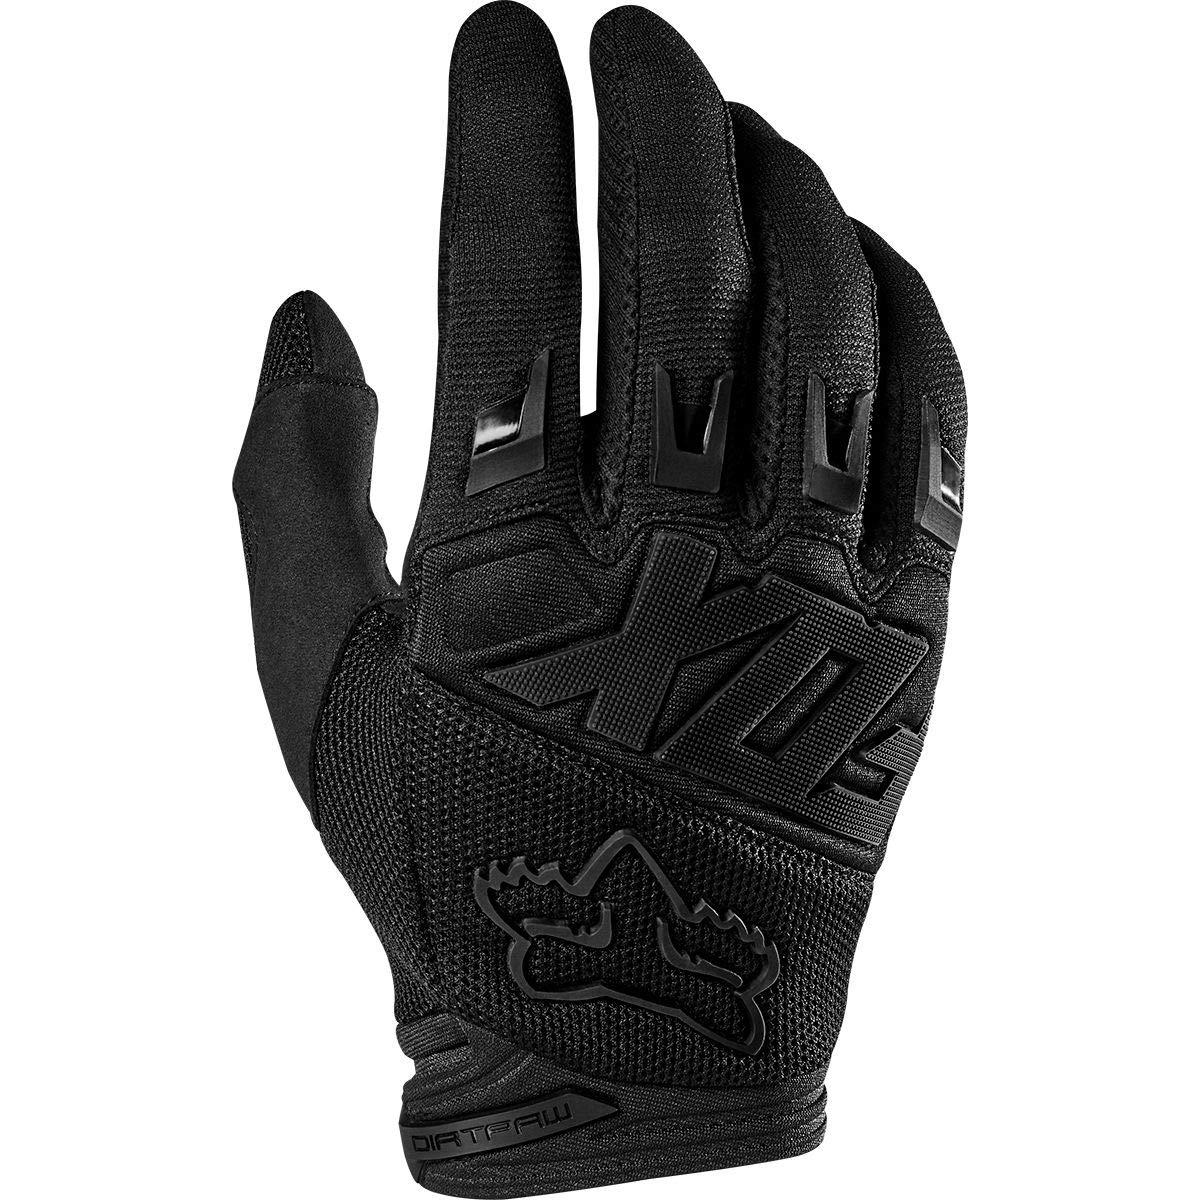 Fox Racing Dirtpaw Glove - Men's Black/Black, M